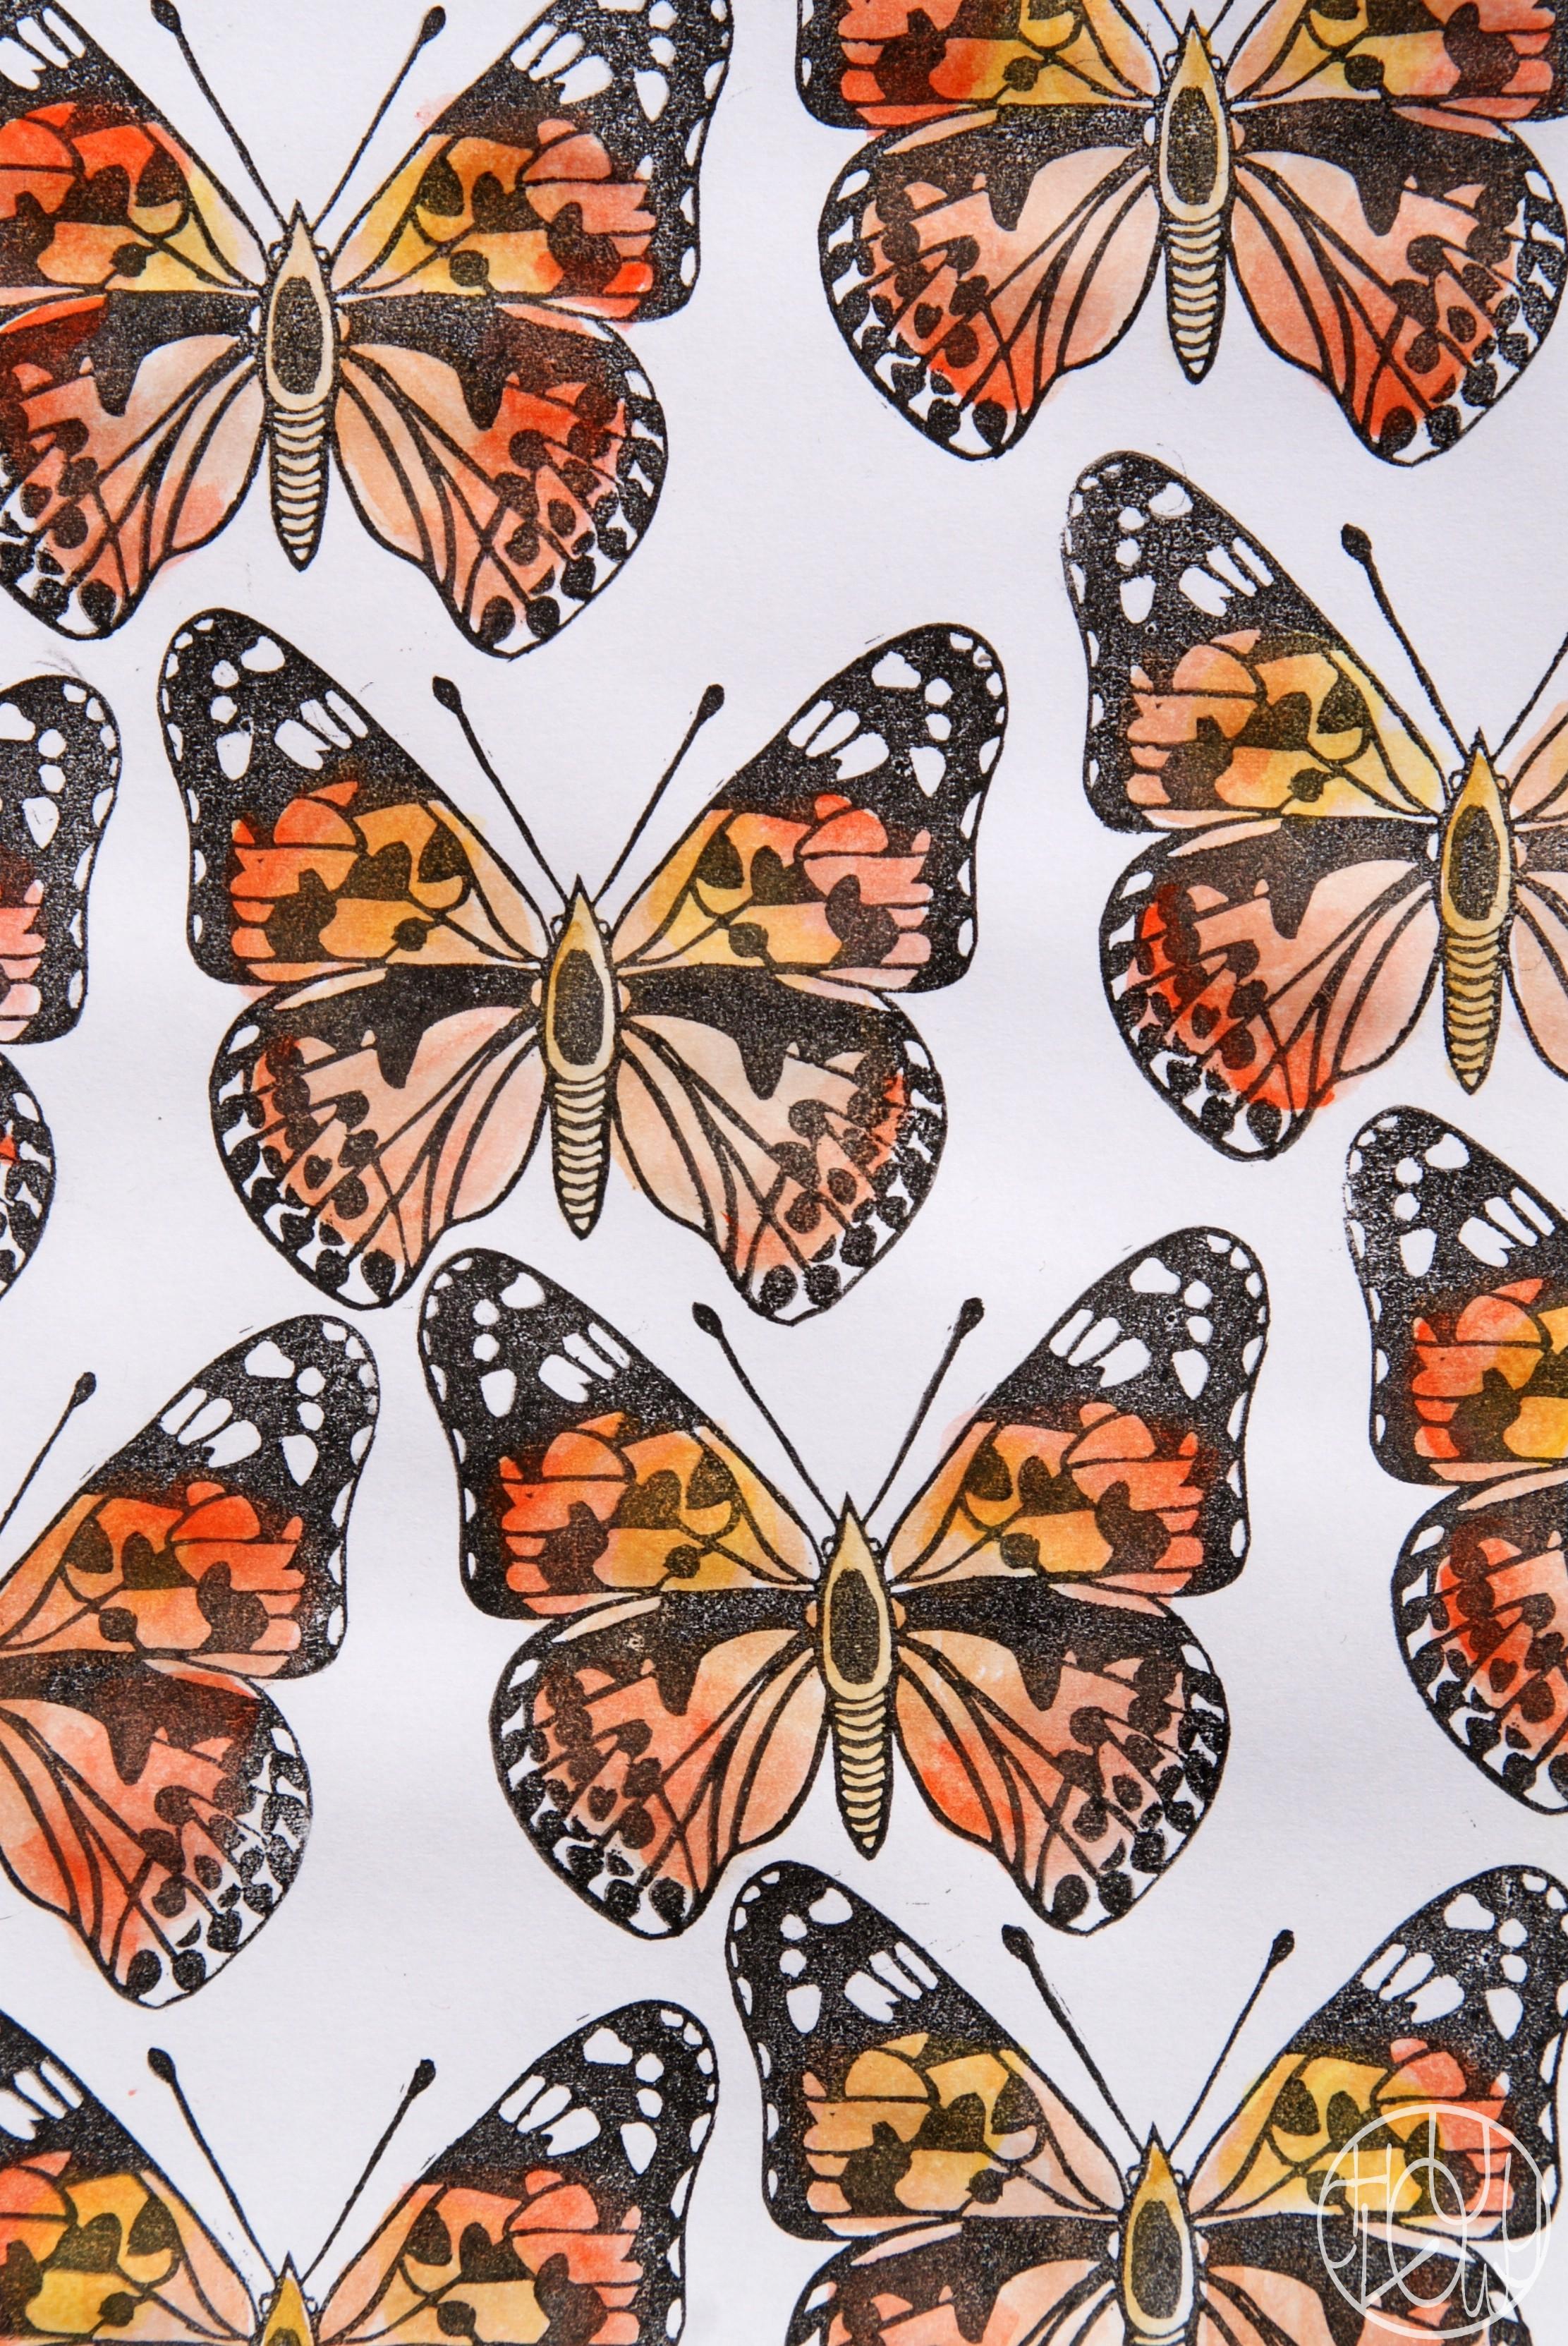 dfi gravure 3052 tampon papillon belle dame